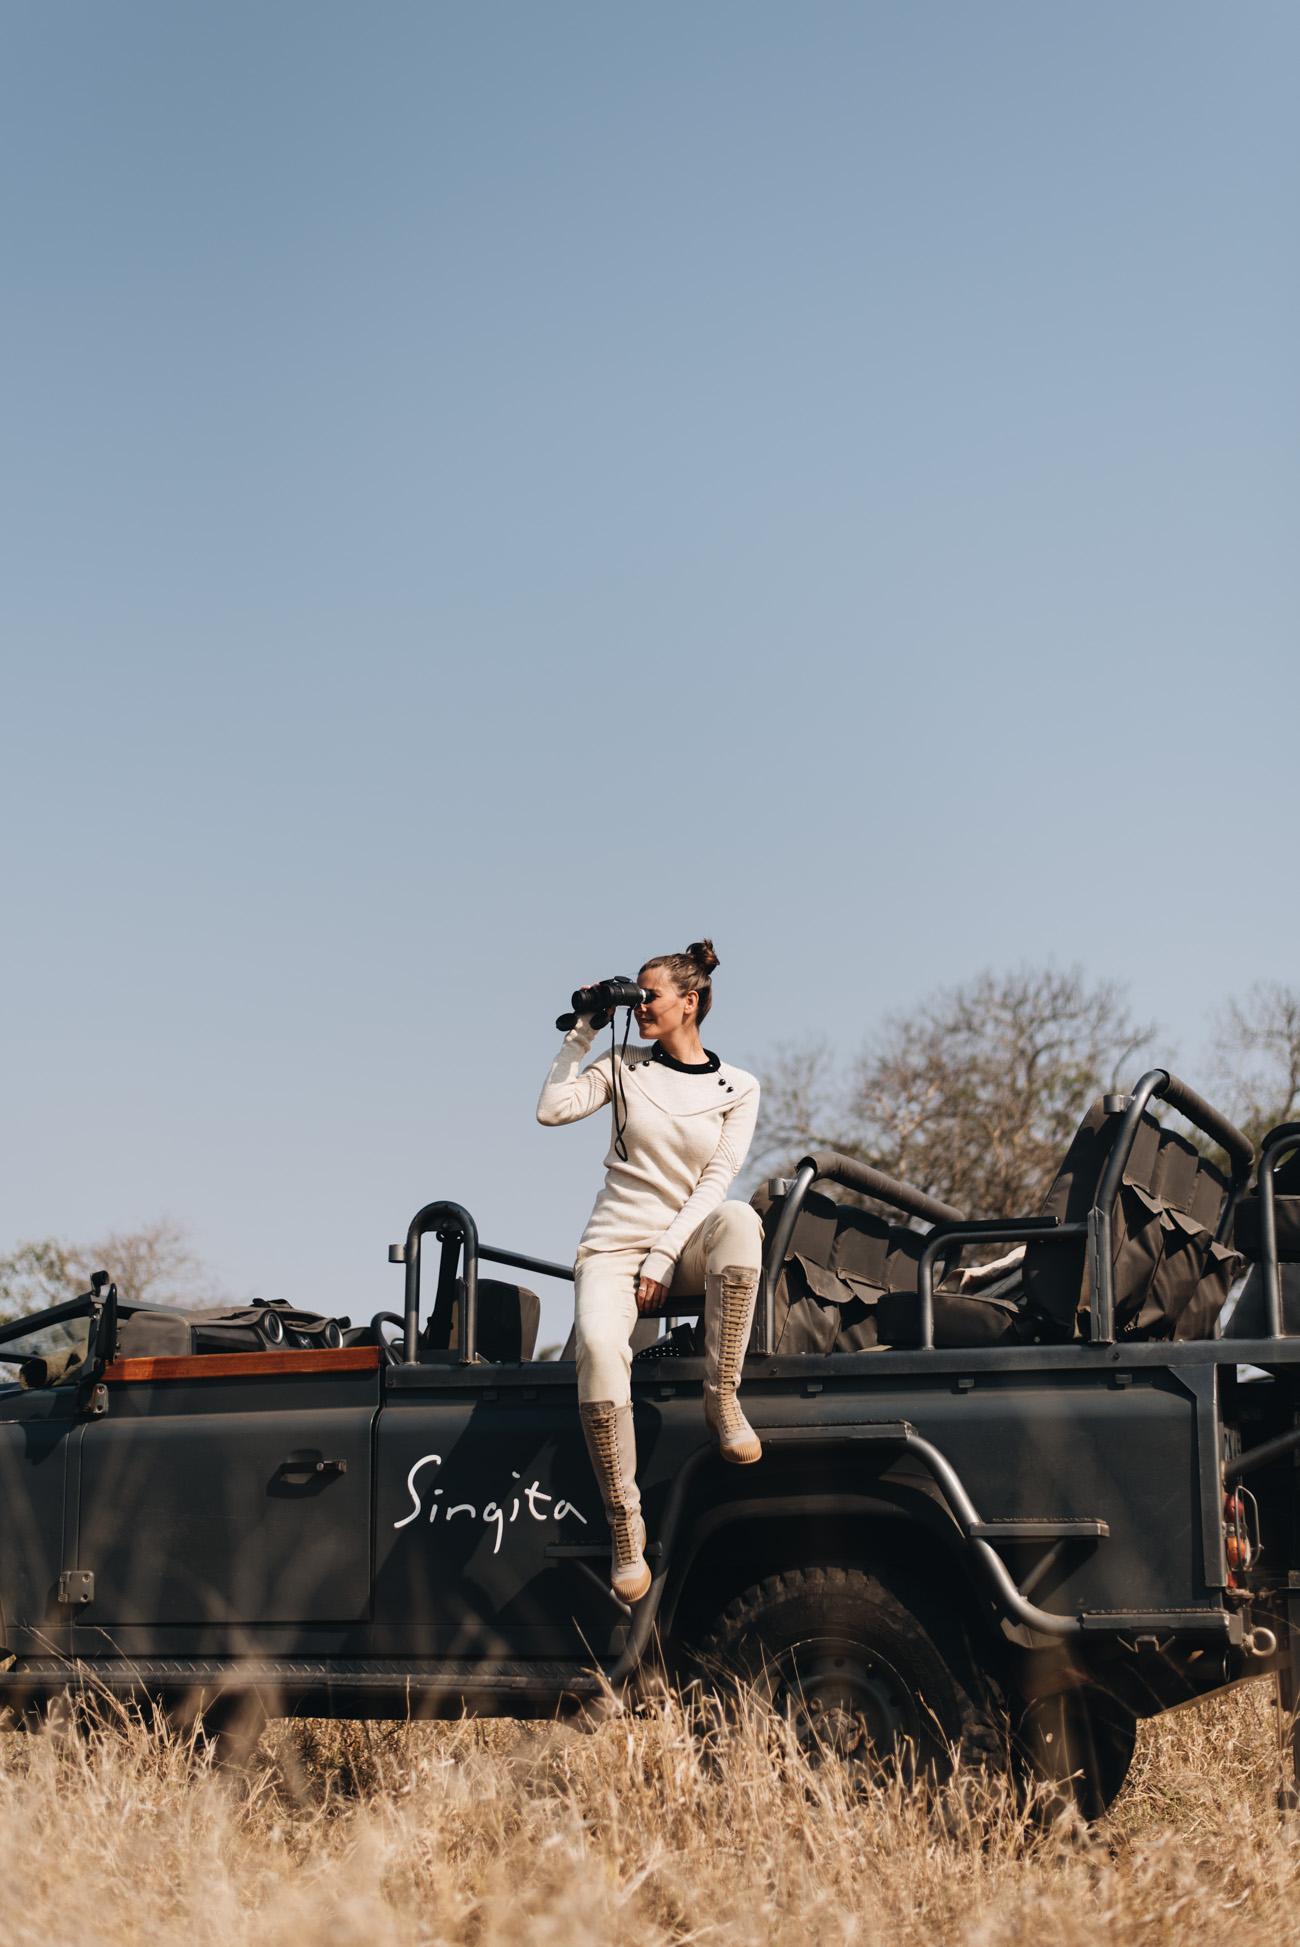 singita-lebombo-lodge-safari-südafrika-krüger-nationalpark-fashiioncarpet-nina-schwichtenberg